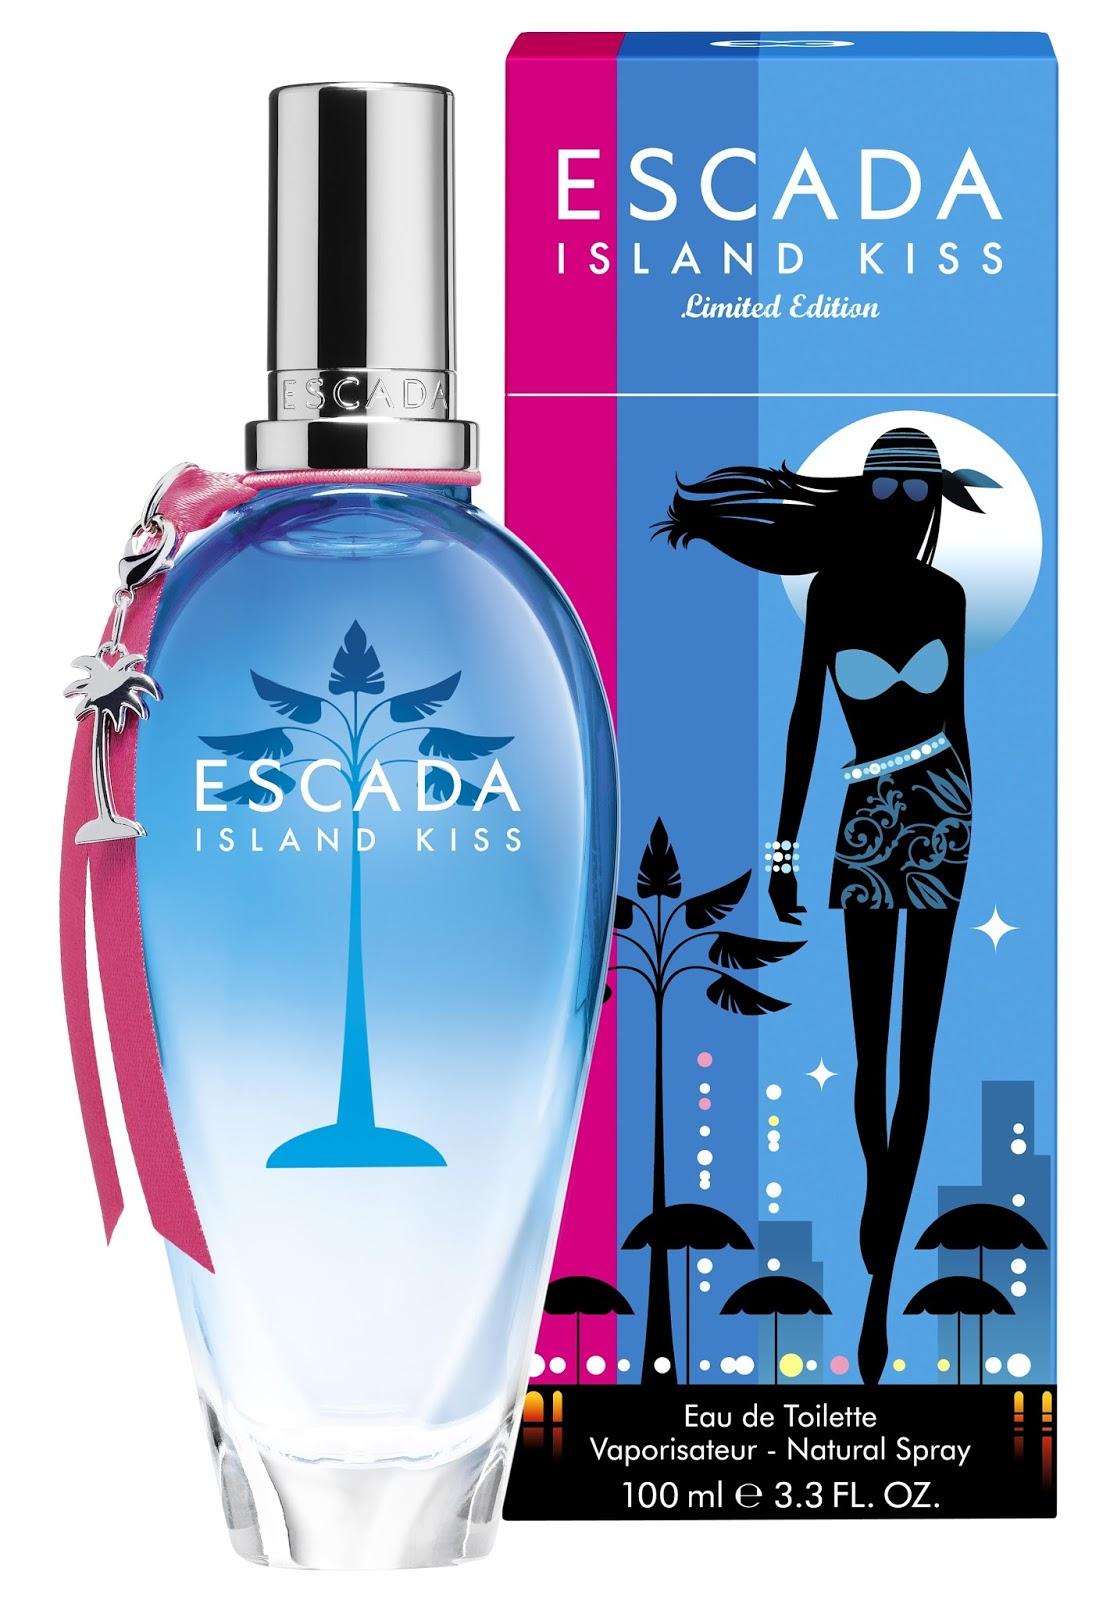 Escada Island Kiss